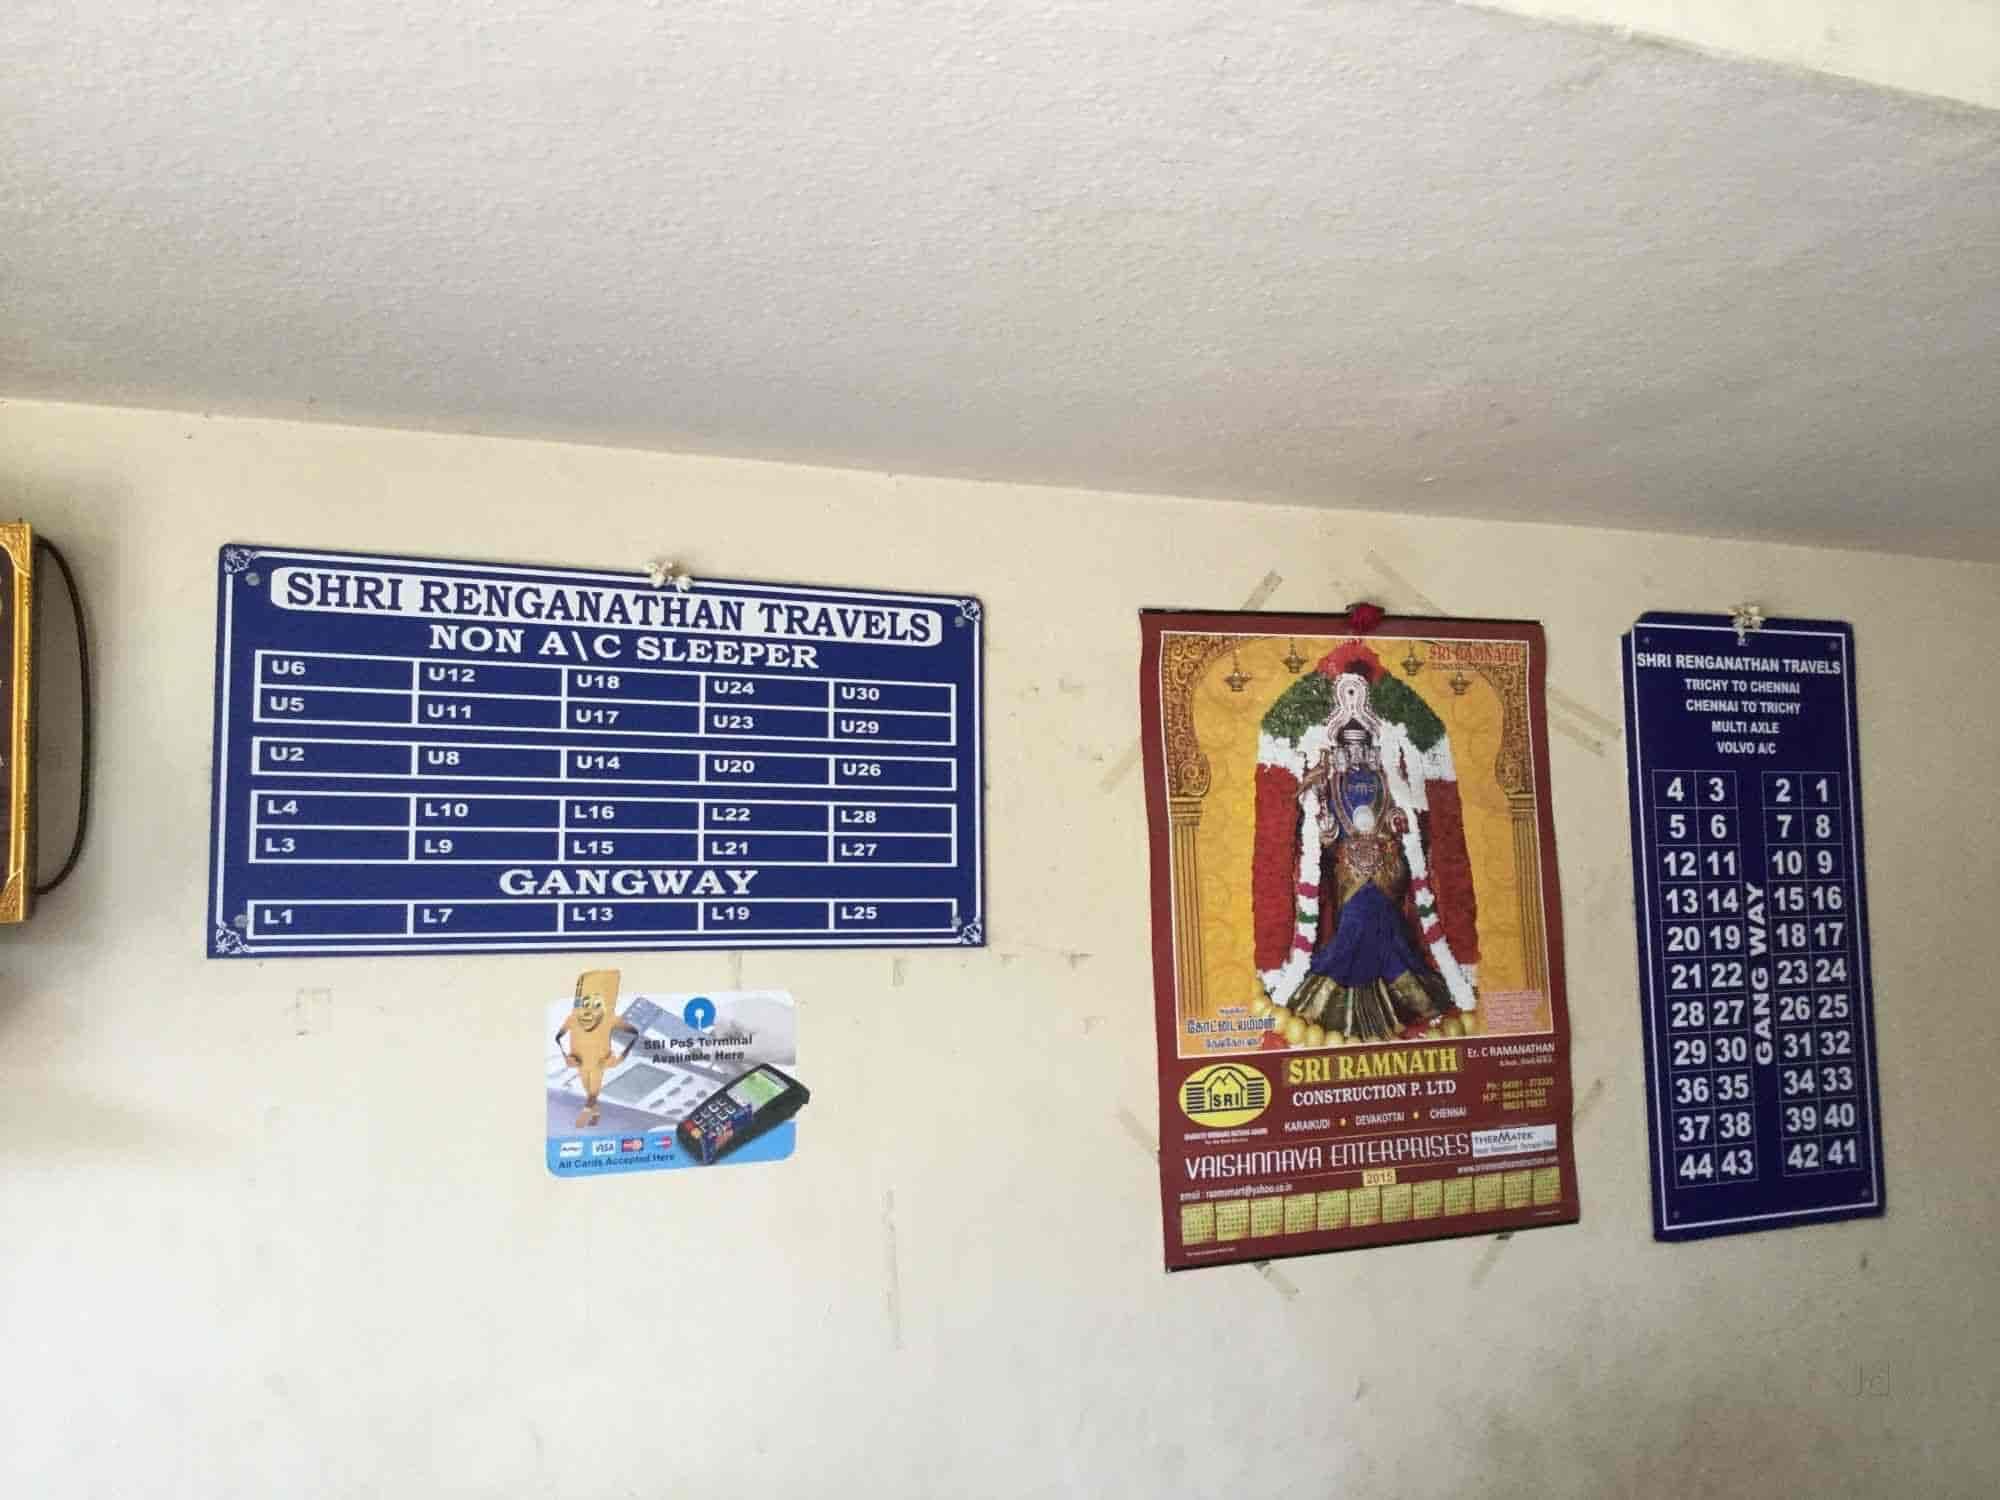 Shri Renganathan Travels Photos, Adyar, Chennai- Pictures & Images